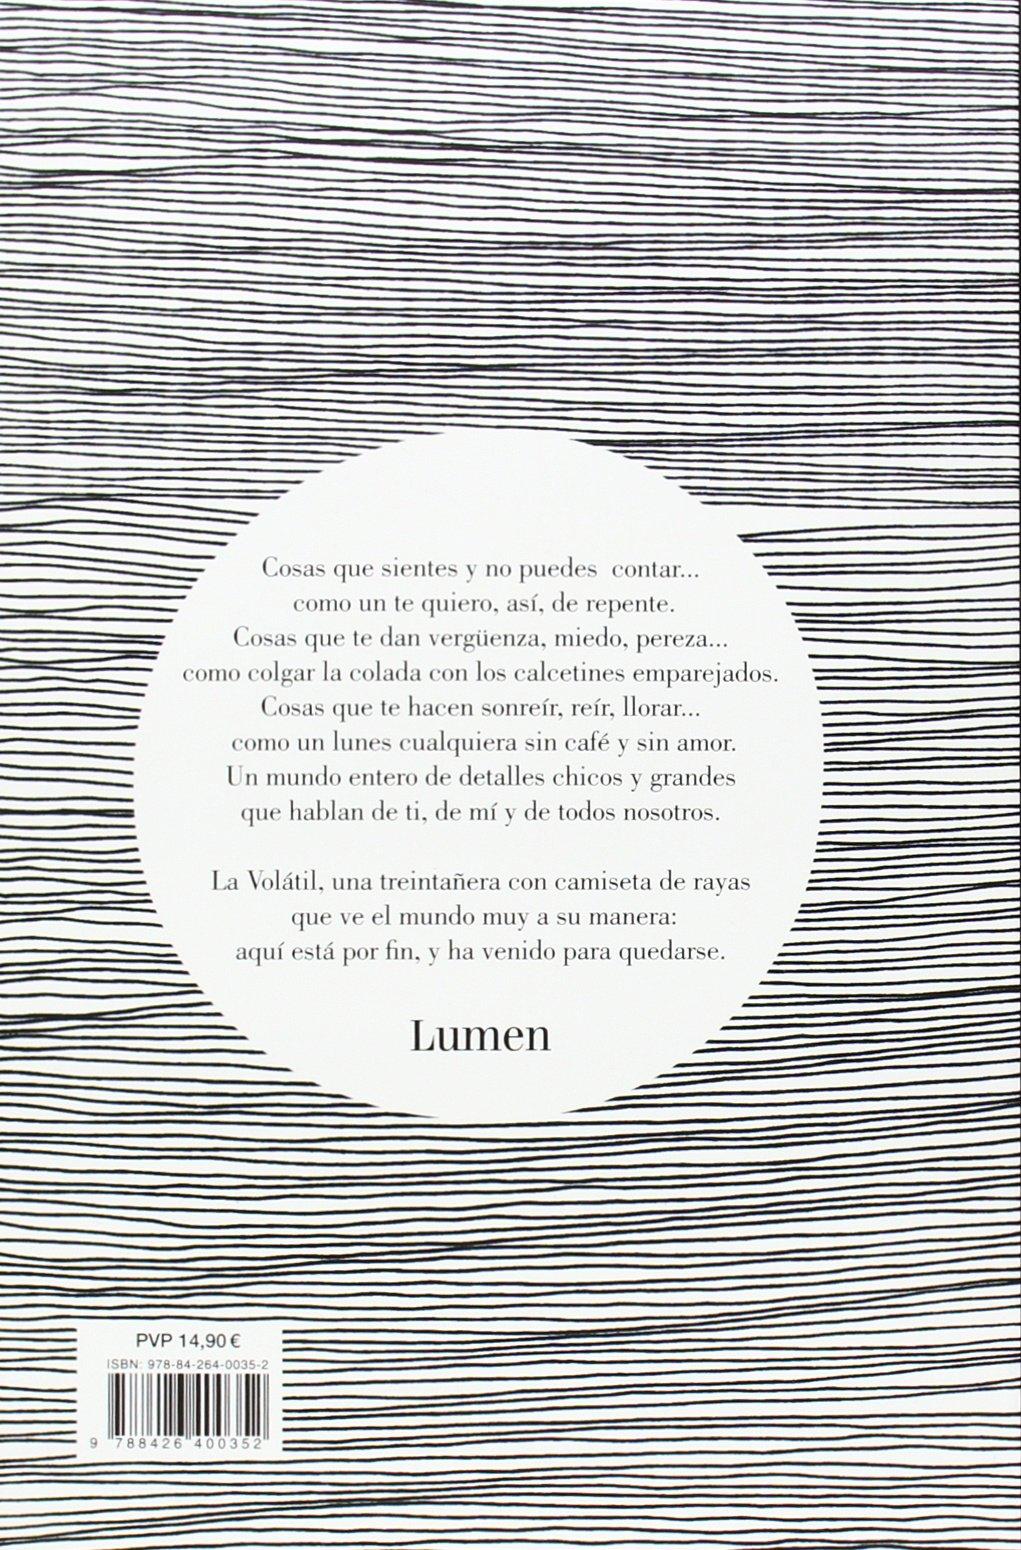 Diario de una volátil: AGUSTINA GUERRERO: 9788426400352: Amazon.com: Books